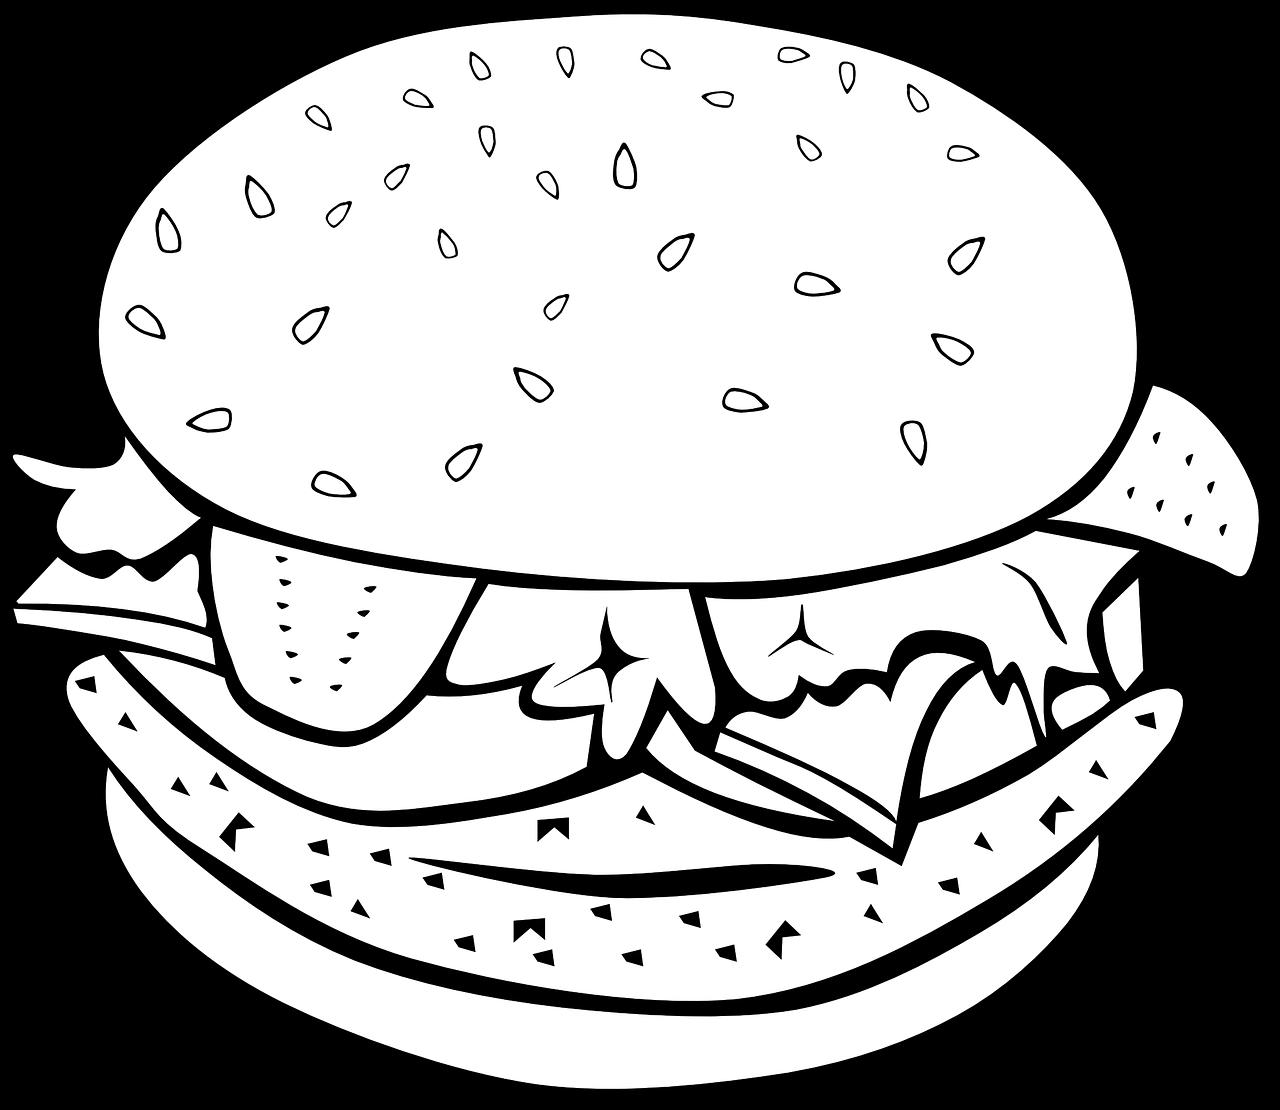 png royalty free library Sandwich hamburger fish free. Vector burger chicken